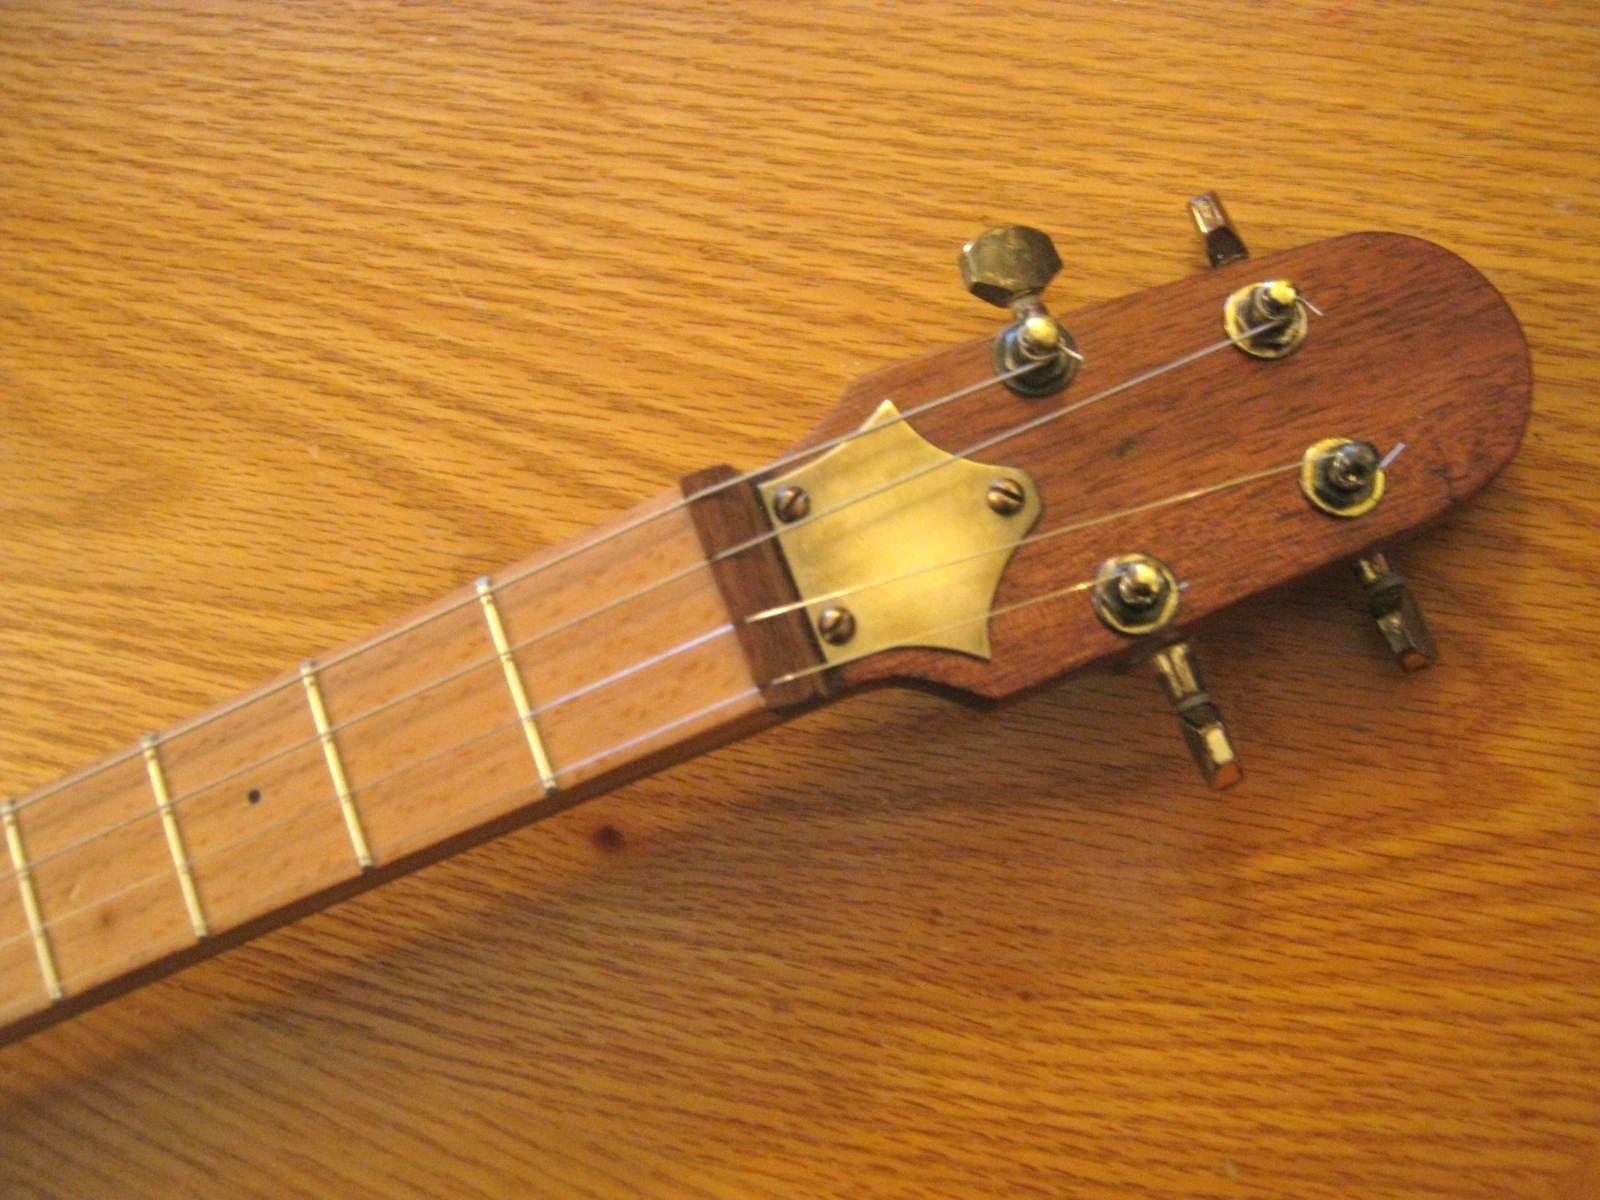 Unique Gremlin Electric Guitar All About Guitars Pinterest